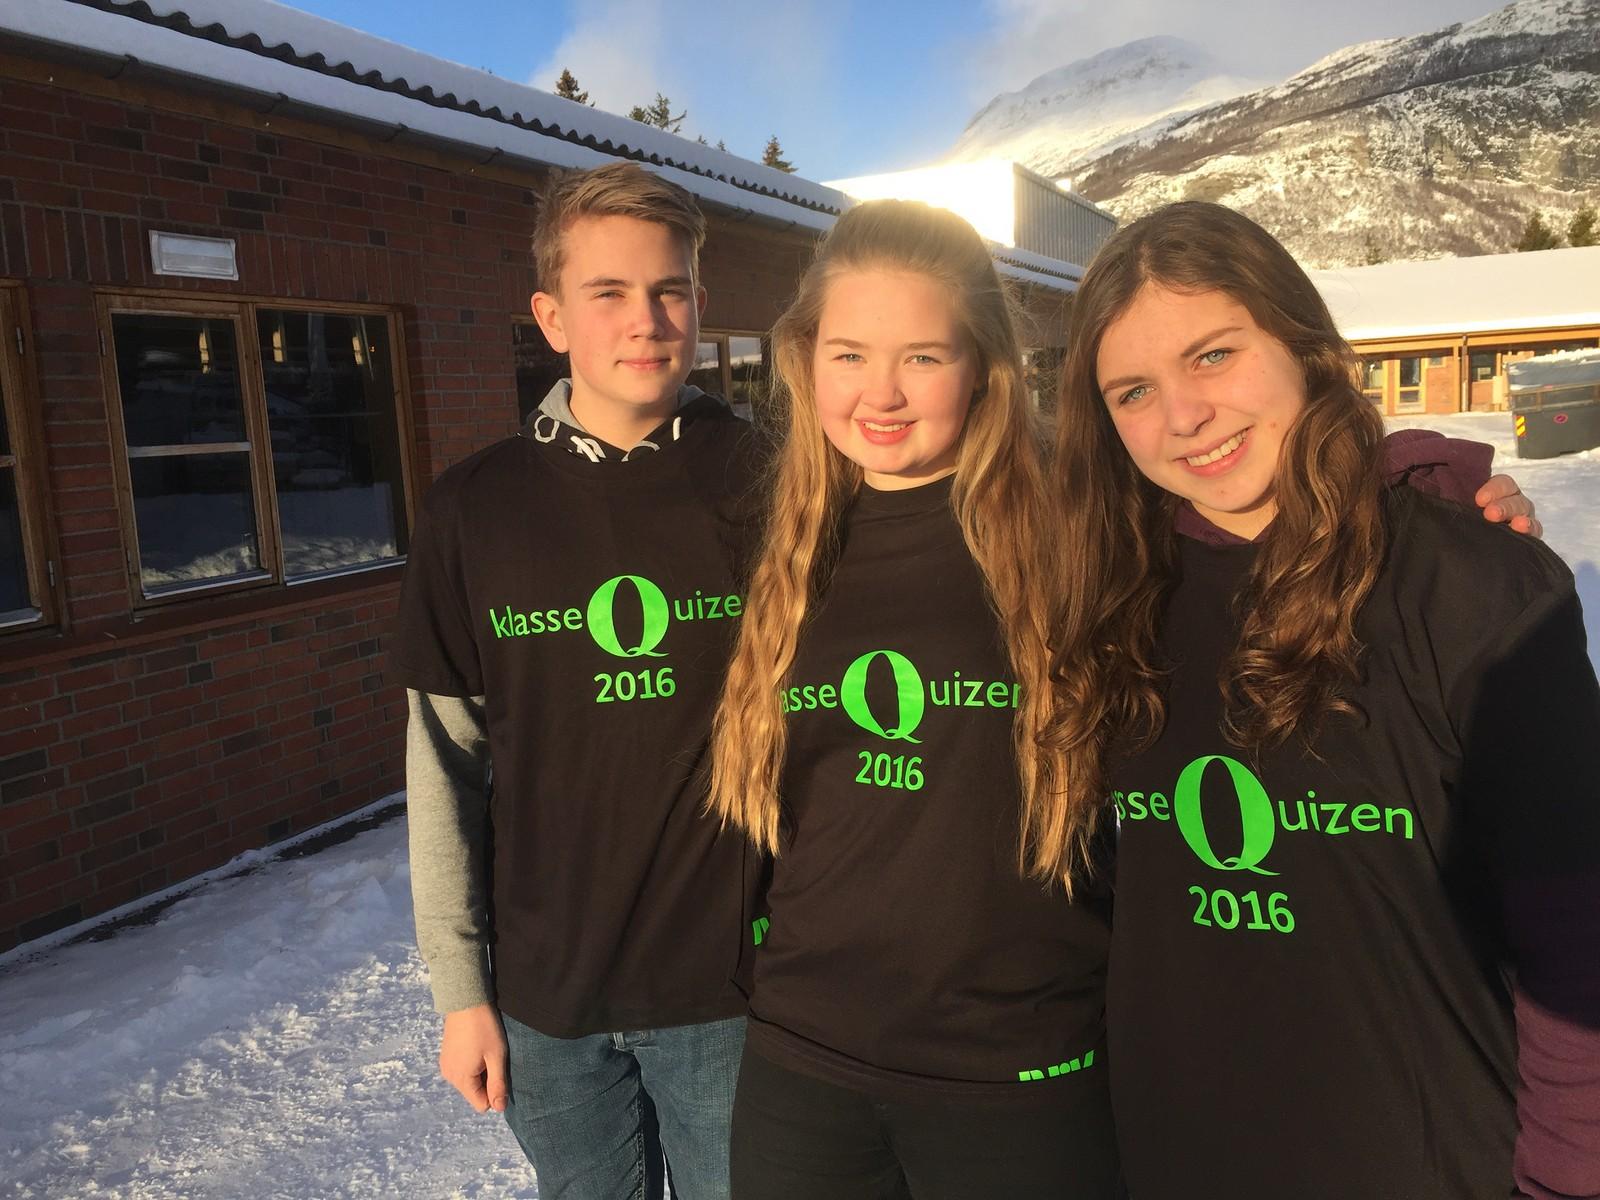 Sander Eltun, Marit Andrisdotter Kvam og Patrycja Mlonek fra Vang barne- og ungdomsskule kan du høre i P1 onsdag 20.1.mellom kl.1430-1500.